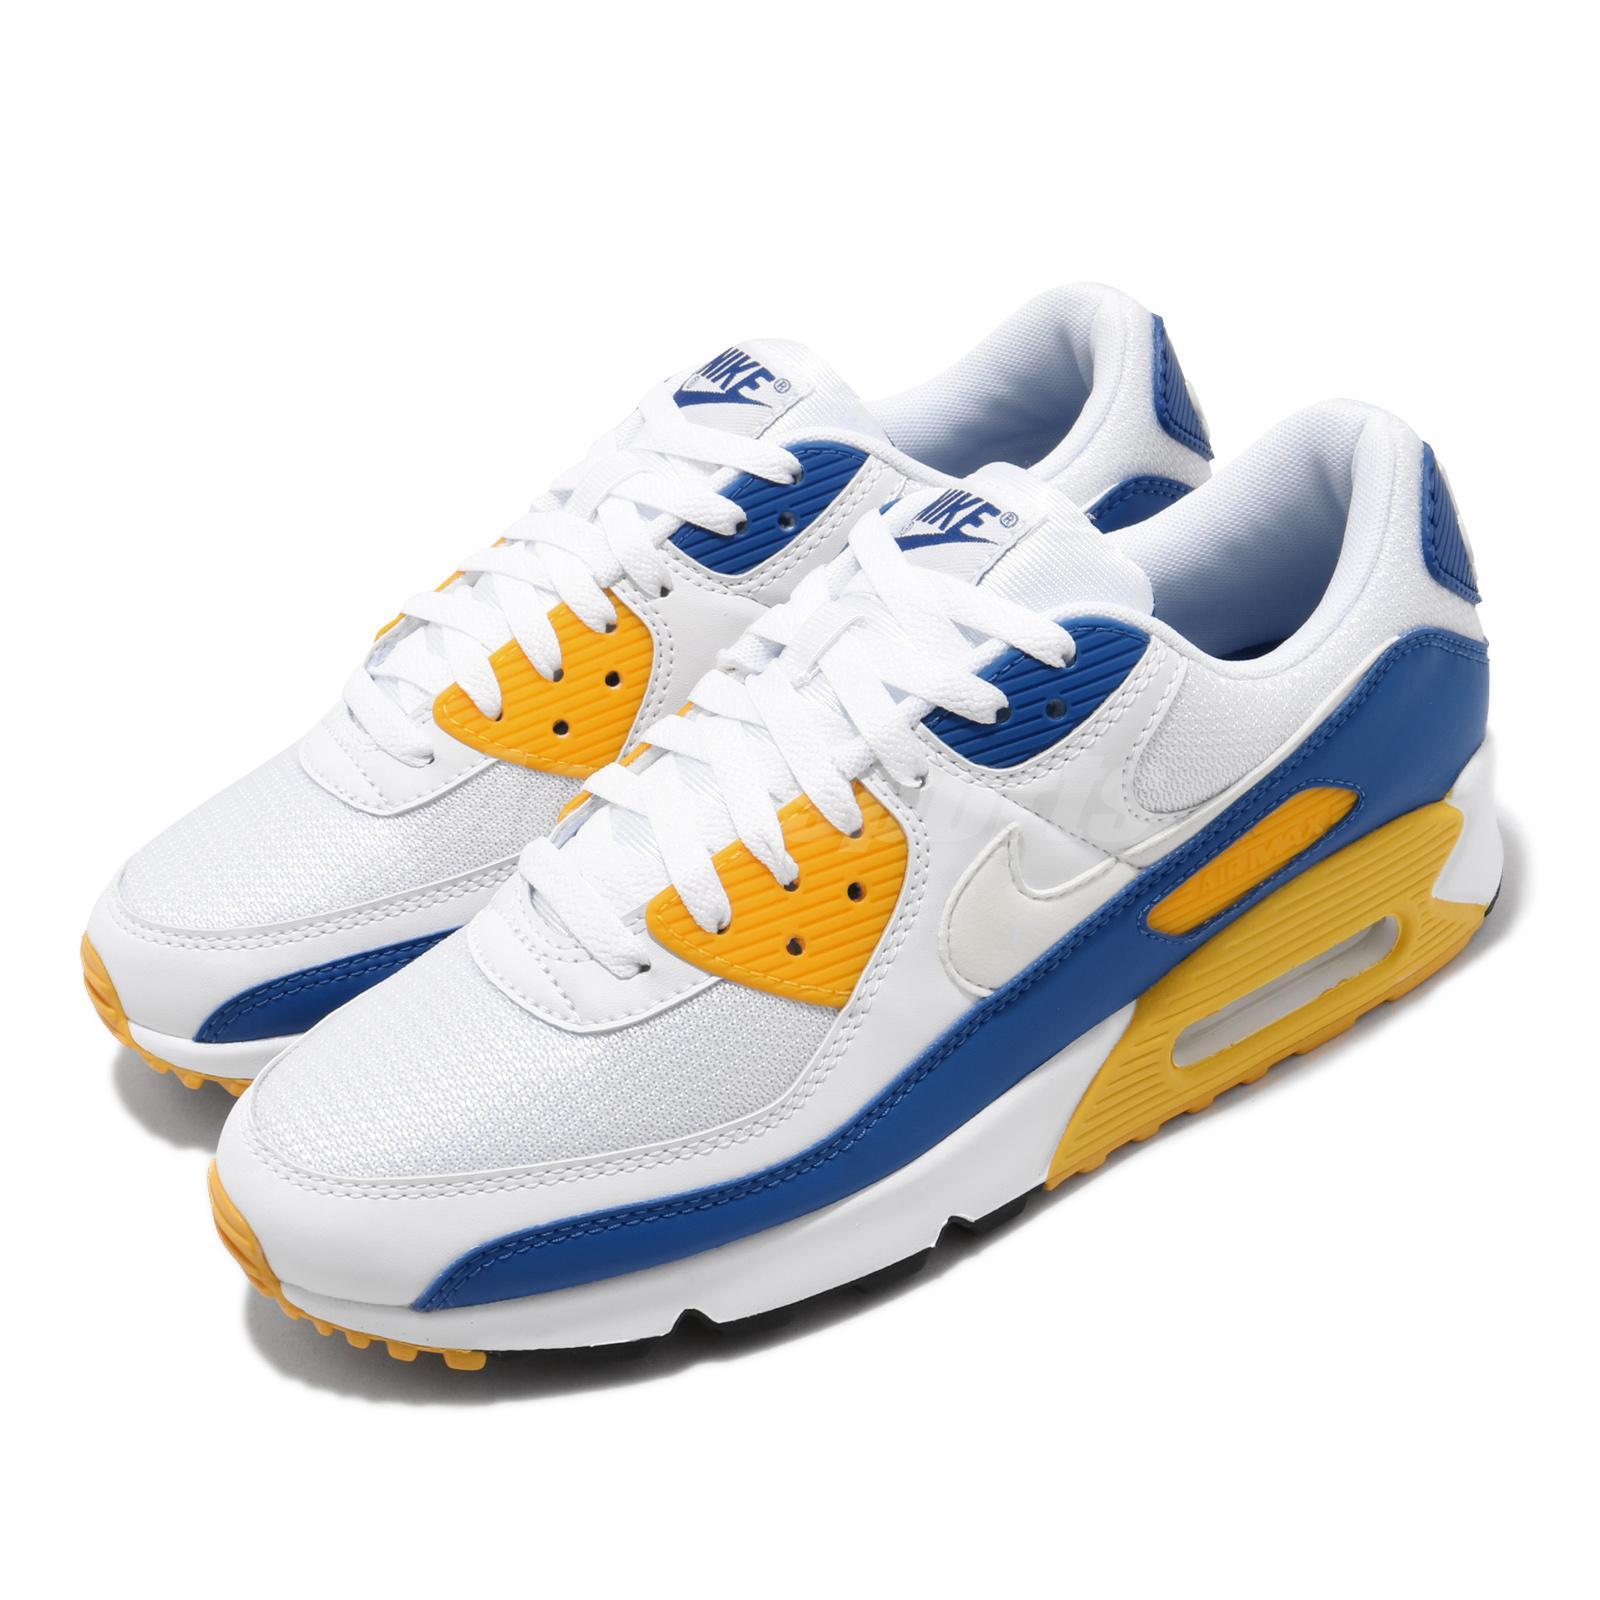 suspender habilidad Coro  Nike Air Max 90 Knicks Warriors Wolverine White Blue Yellow Men Shoes  CT4352-101 | eBay